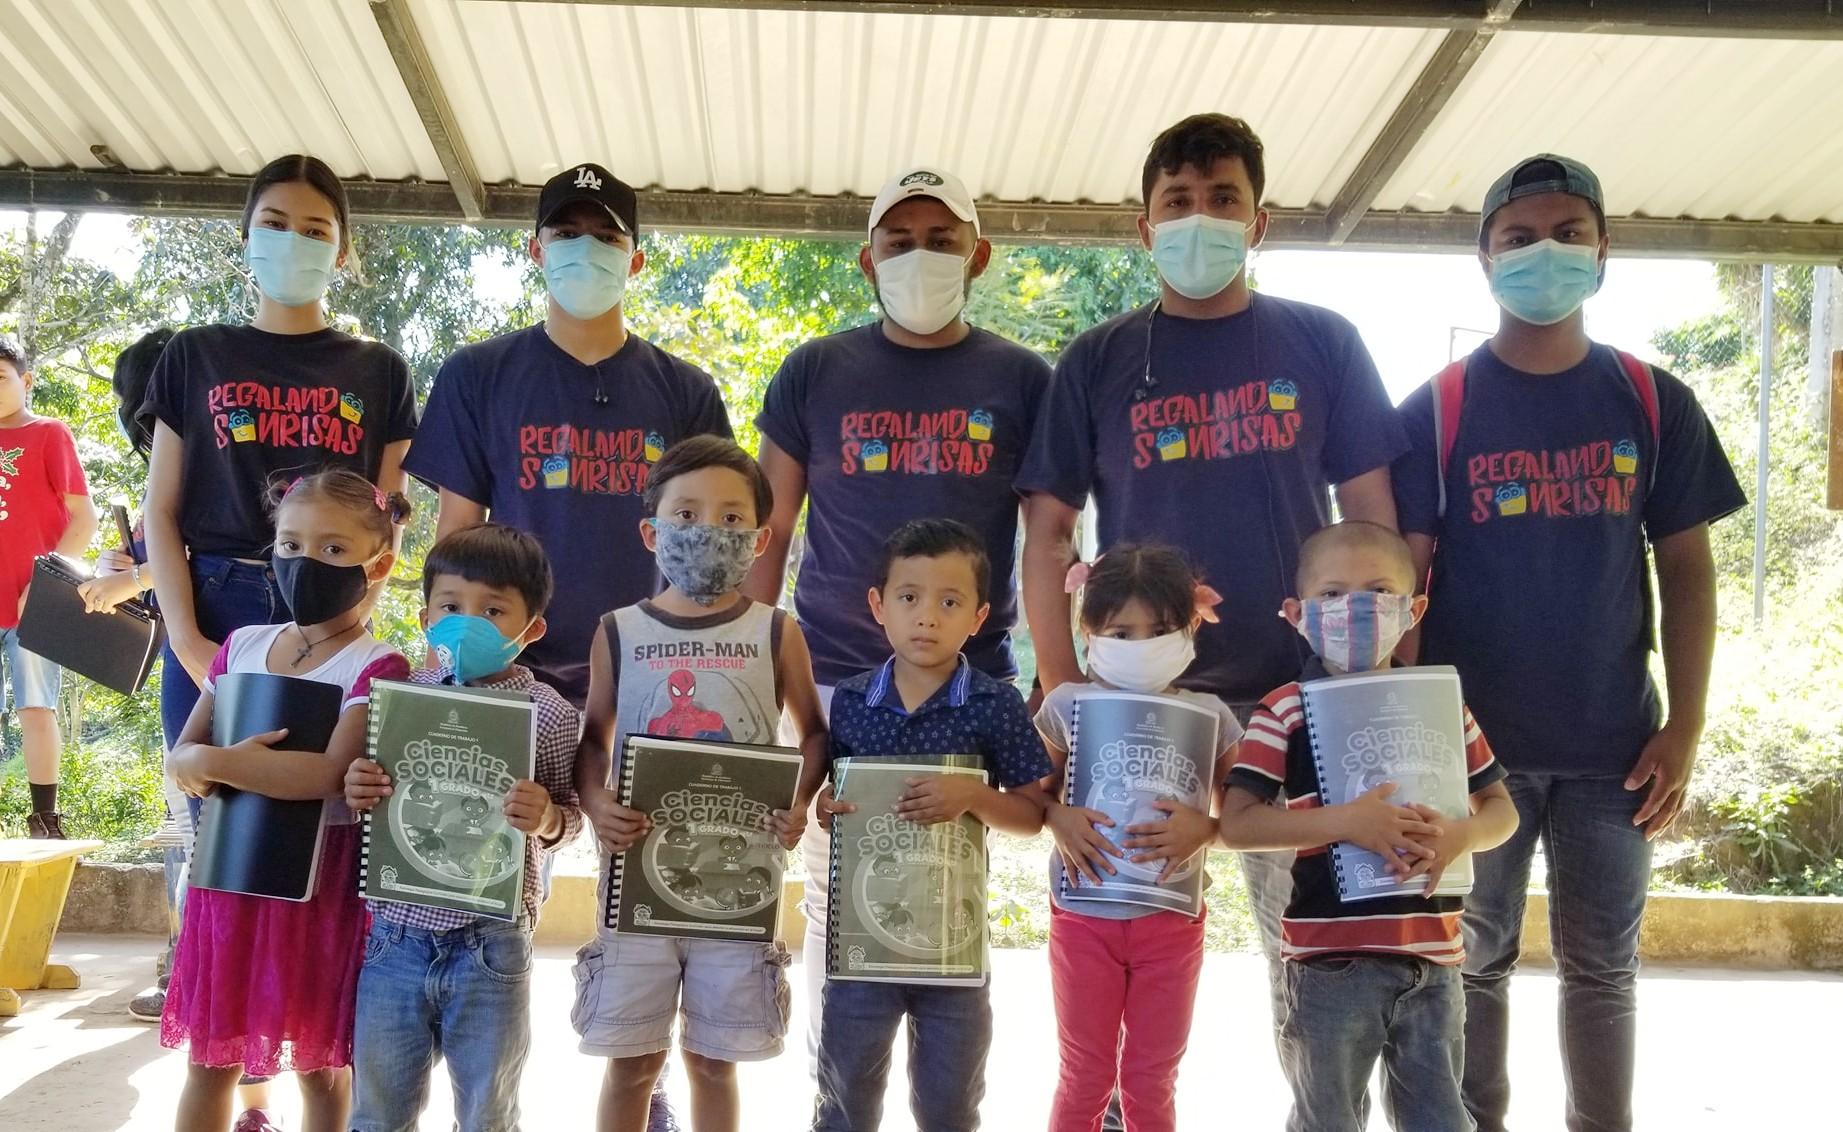 Regalando Sonrisas donaron cuadernillos a niños de Honduras